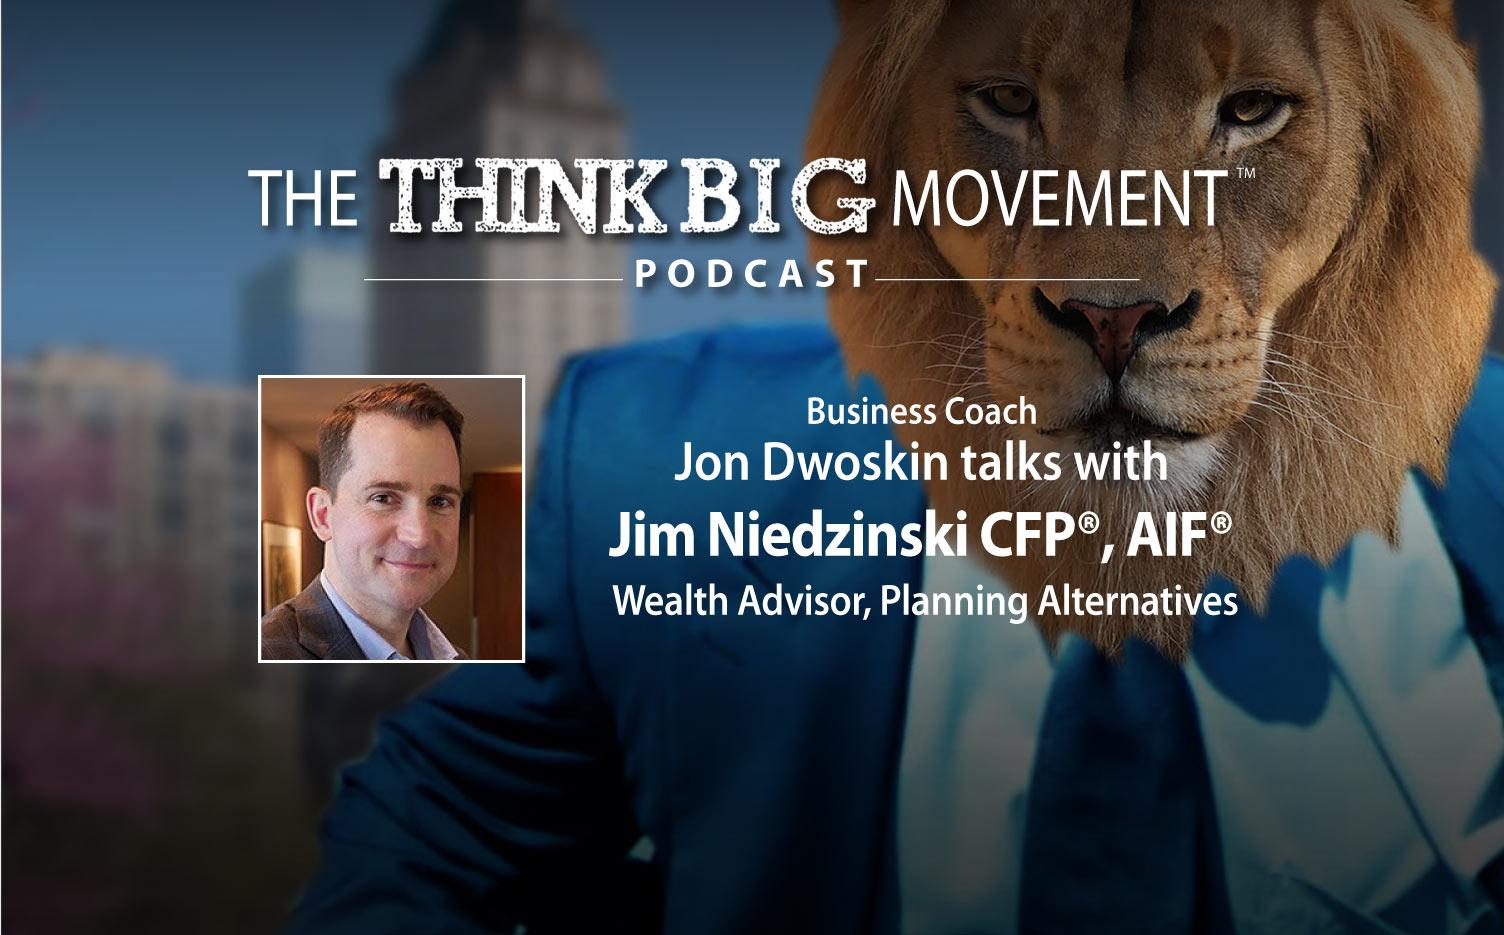 Think Big Movement Podcast: Jon Dwoskin Interviews Jim Niedzinski CFP®, AIF®, Wealth Advisor, Planning Alternatives